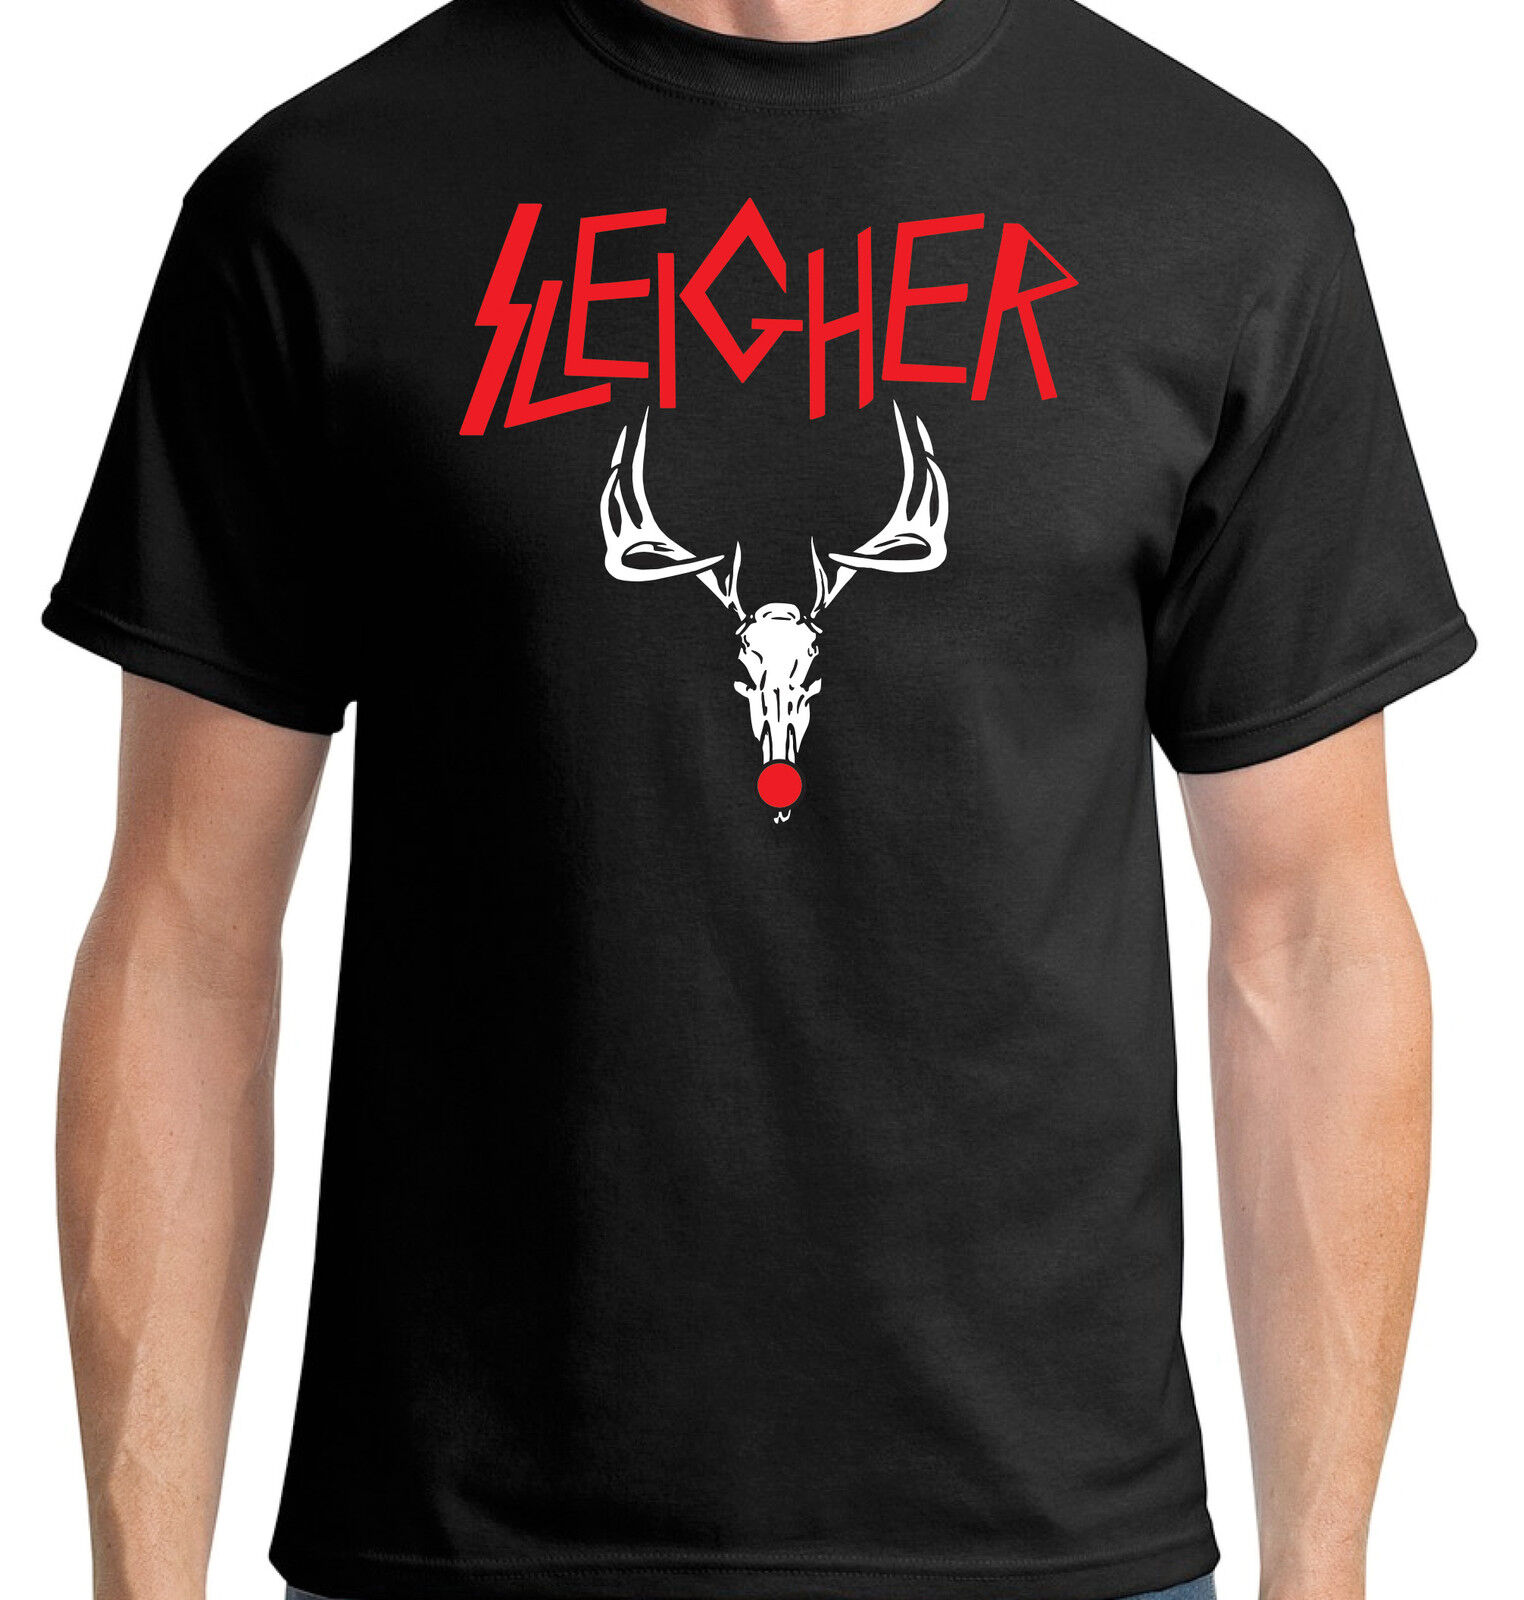 T-shirt sleigher-Heavy Renne Metal Rock Thrash Drôle Noël Rudolph Renne  sleigher- 176b3c8d726e